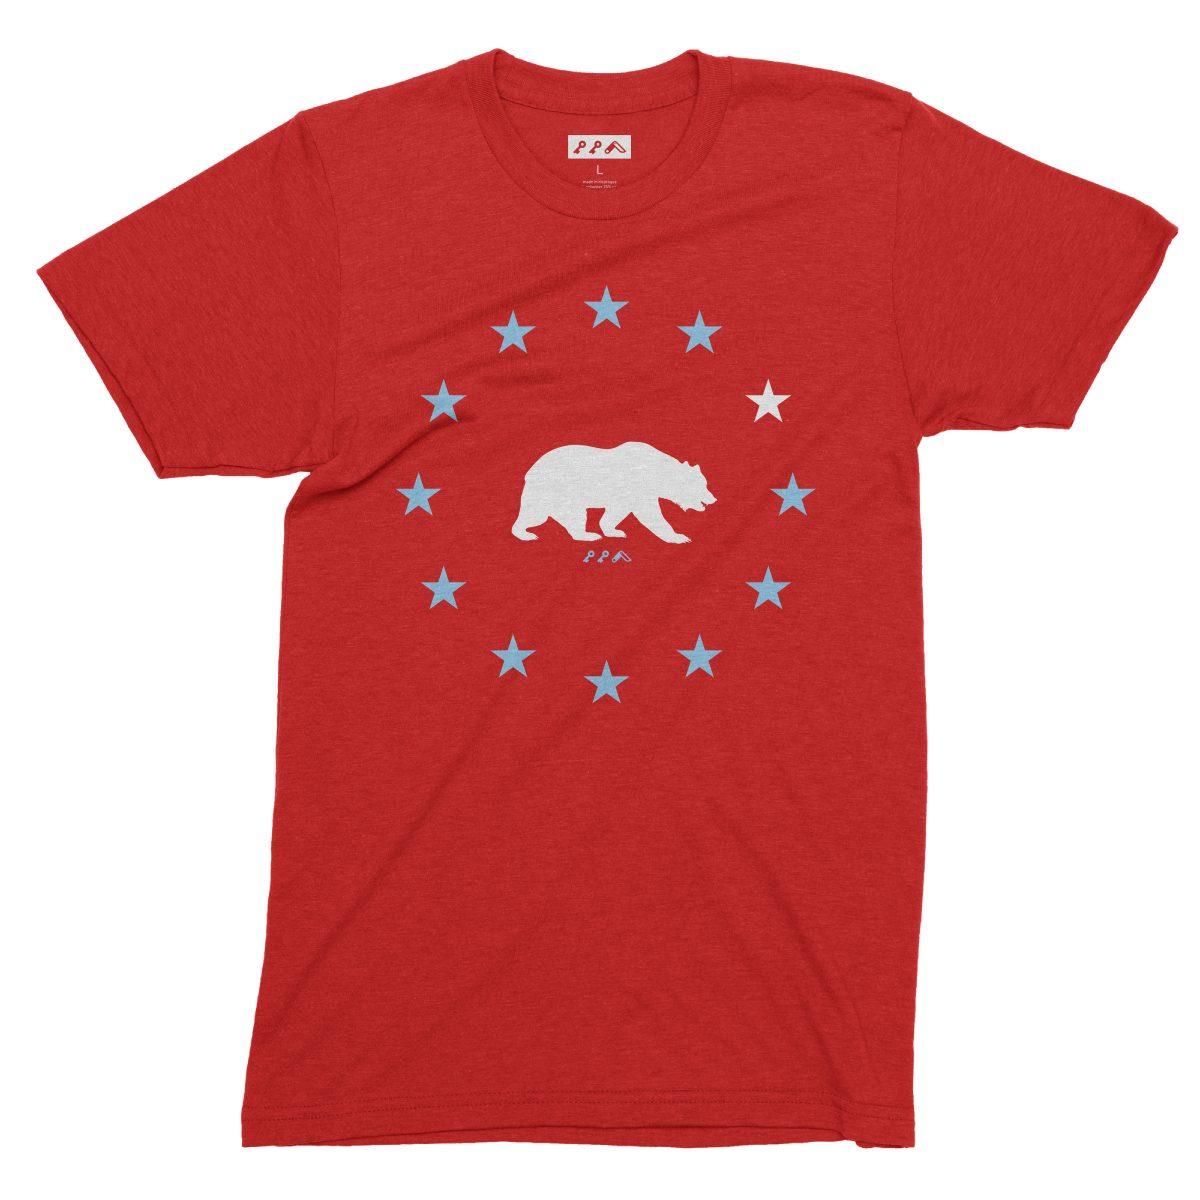 STAR GAZING california republic cal bears tees in red